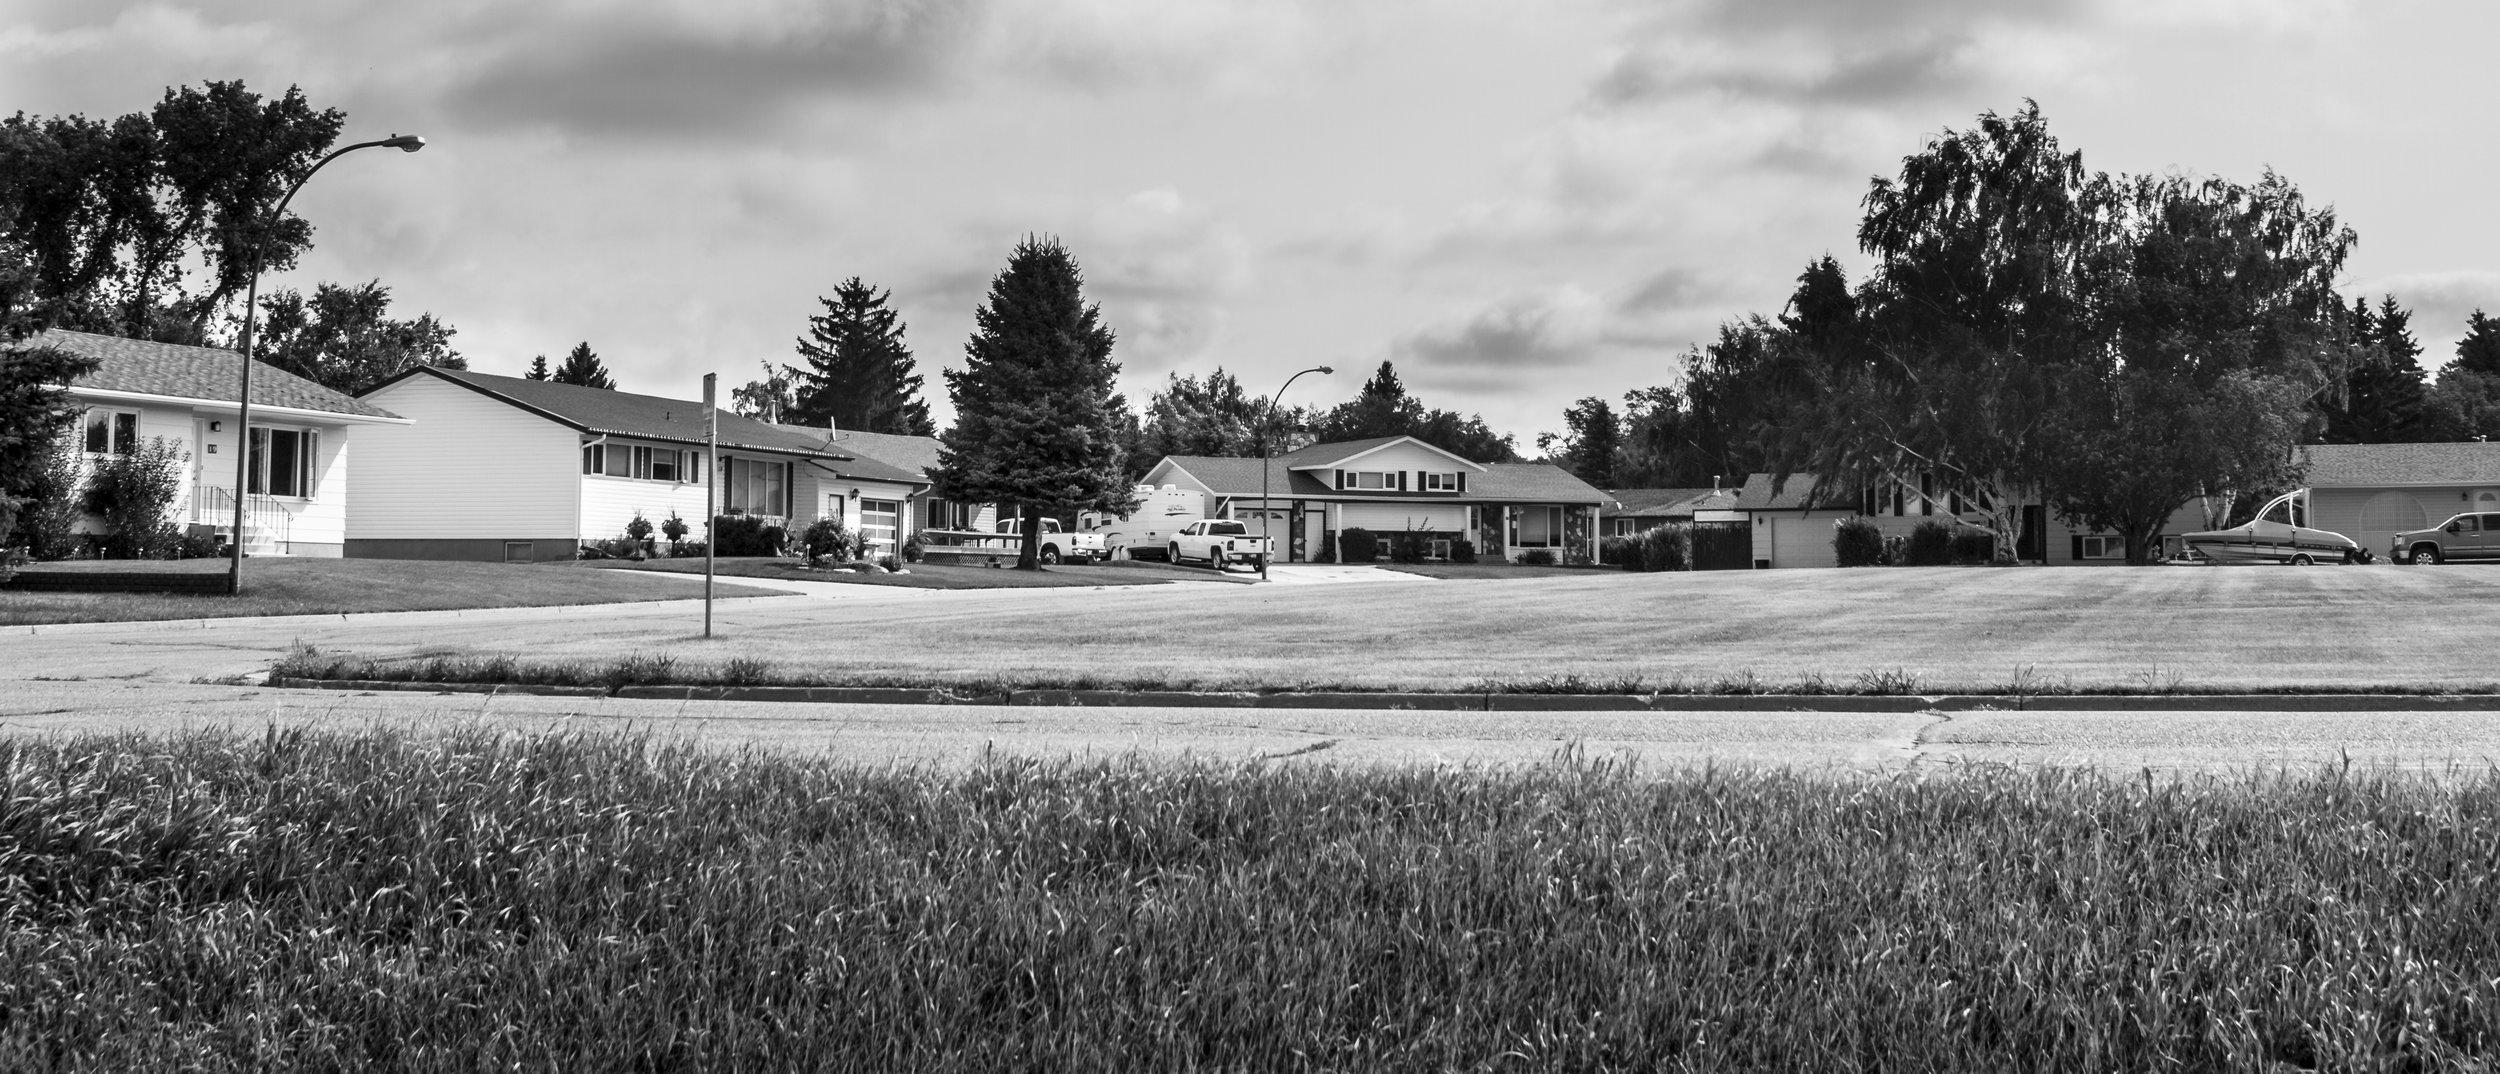 Tufts Crescent, Outlook, Saskatchewan, 2017